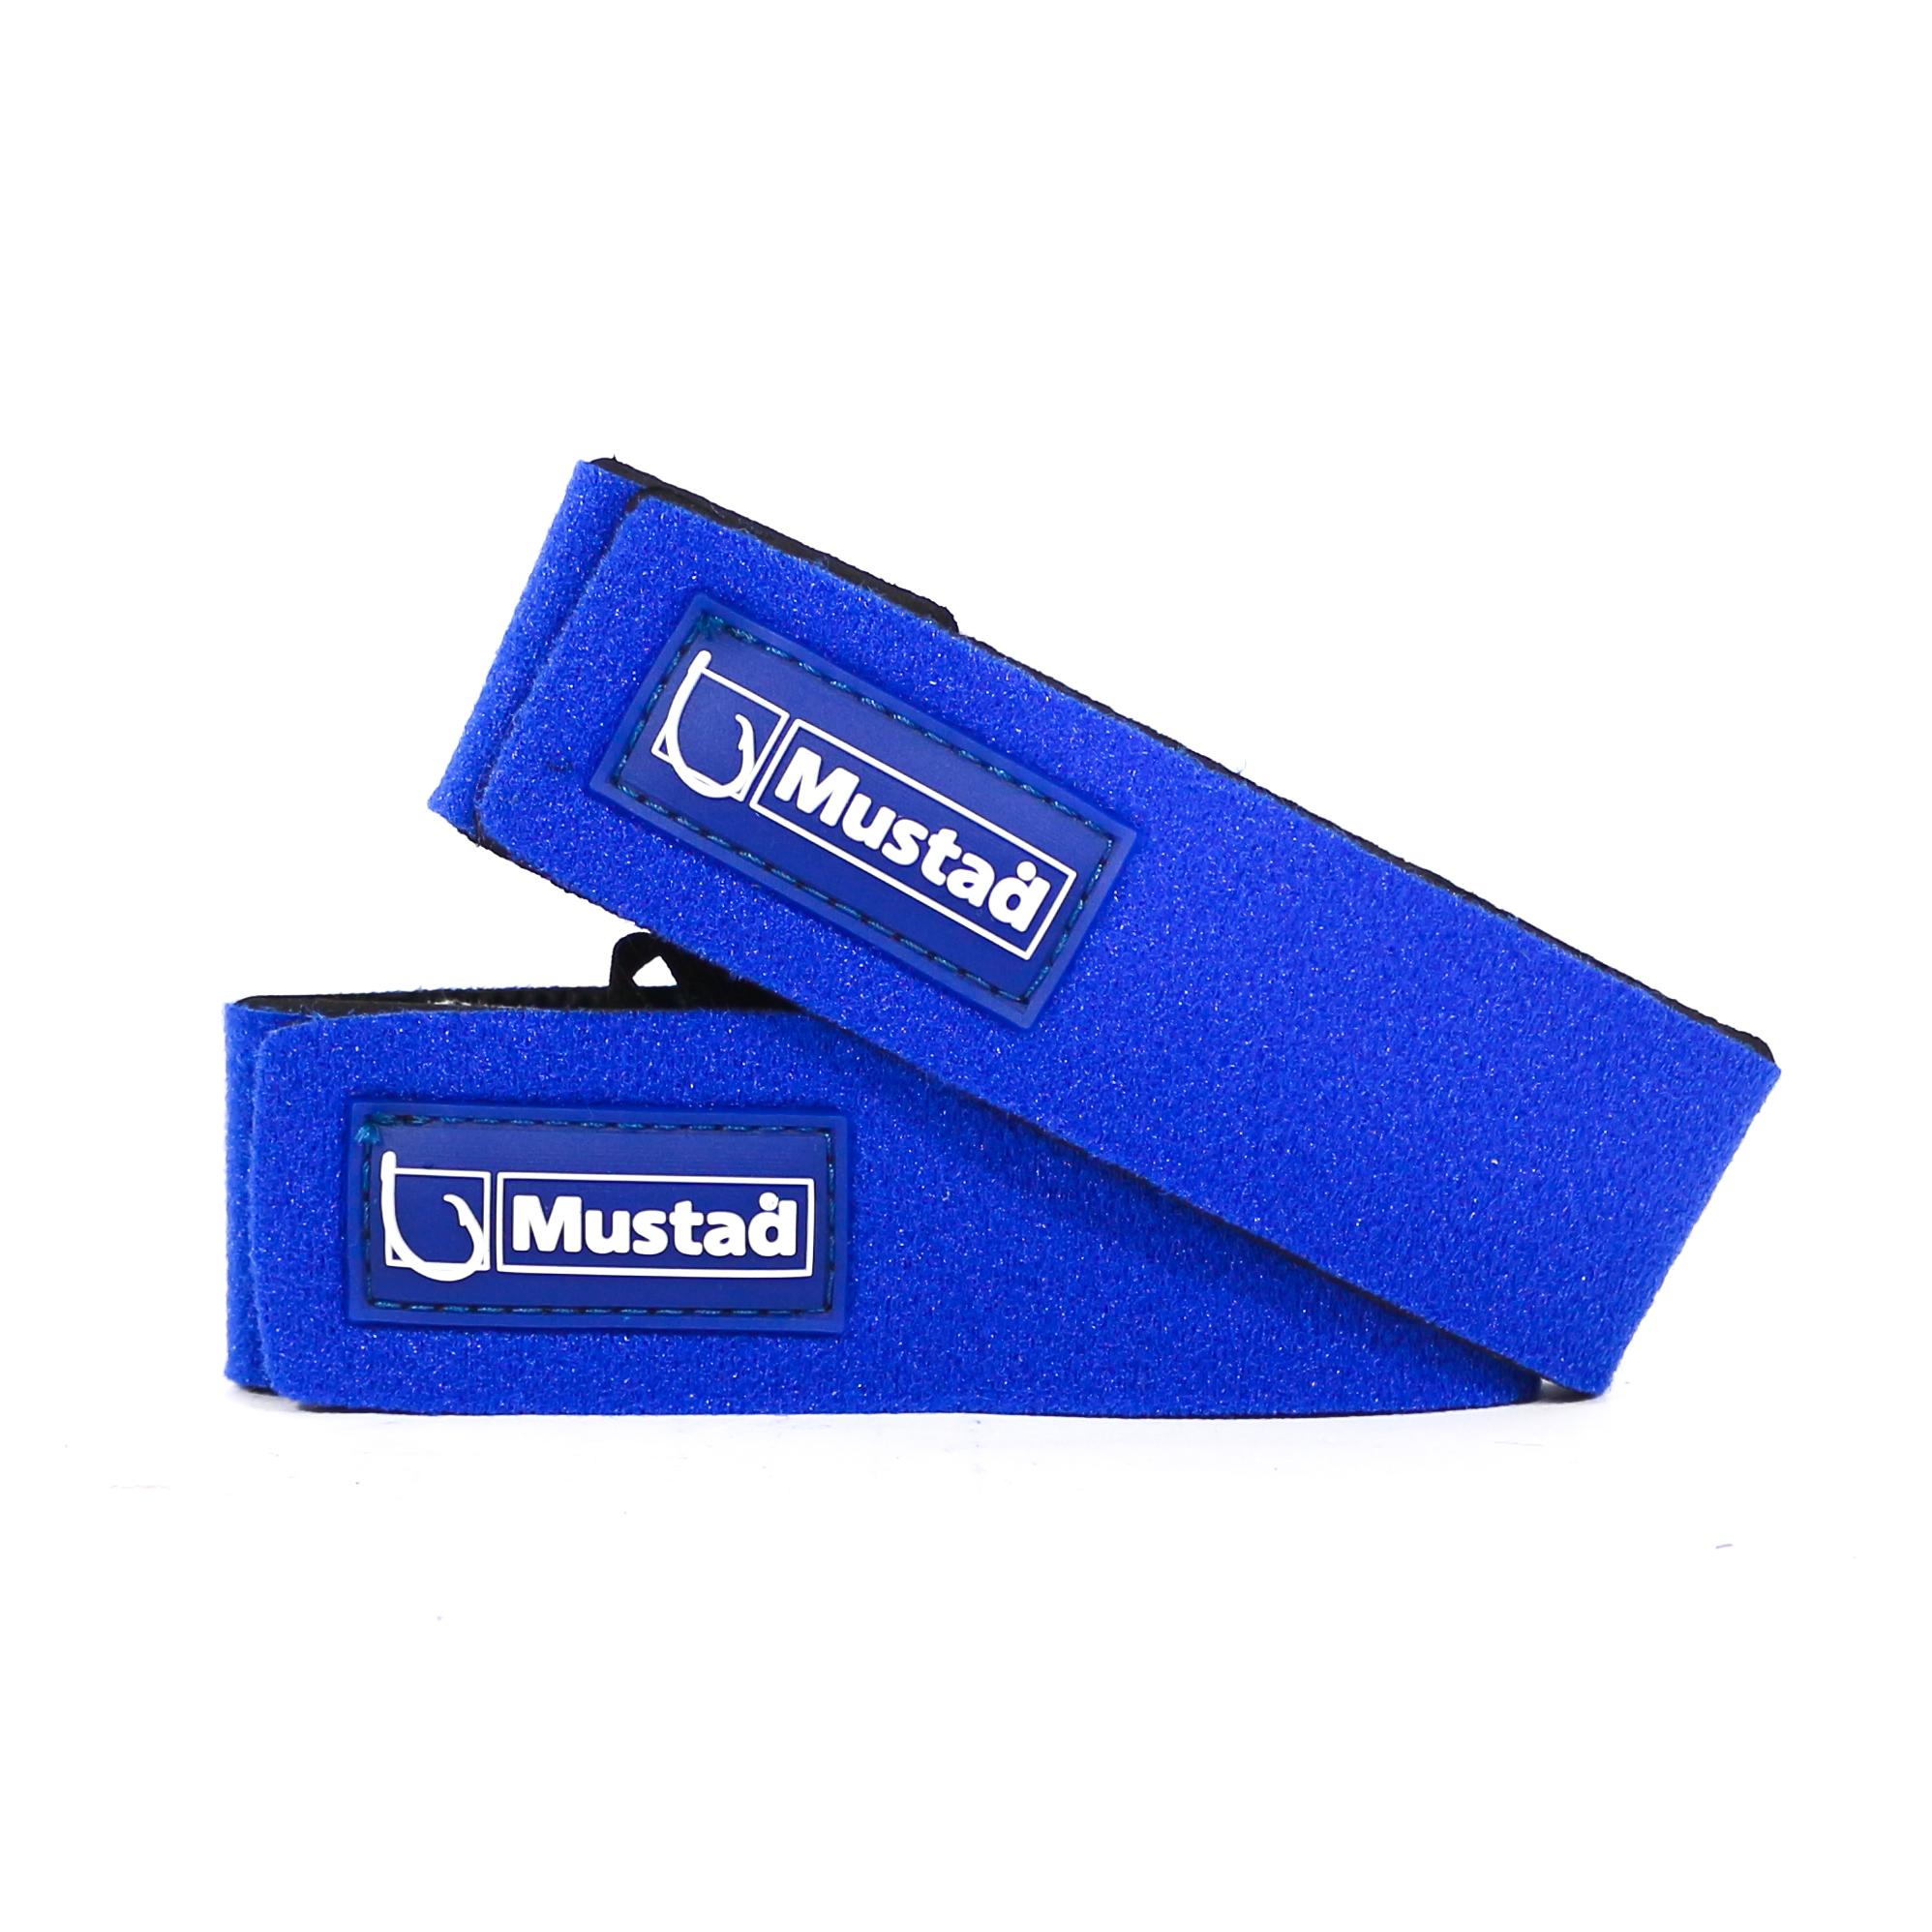 Mustad Rod Band Neoprene Blue Size M (5452)